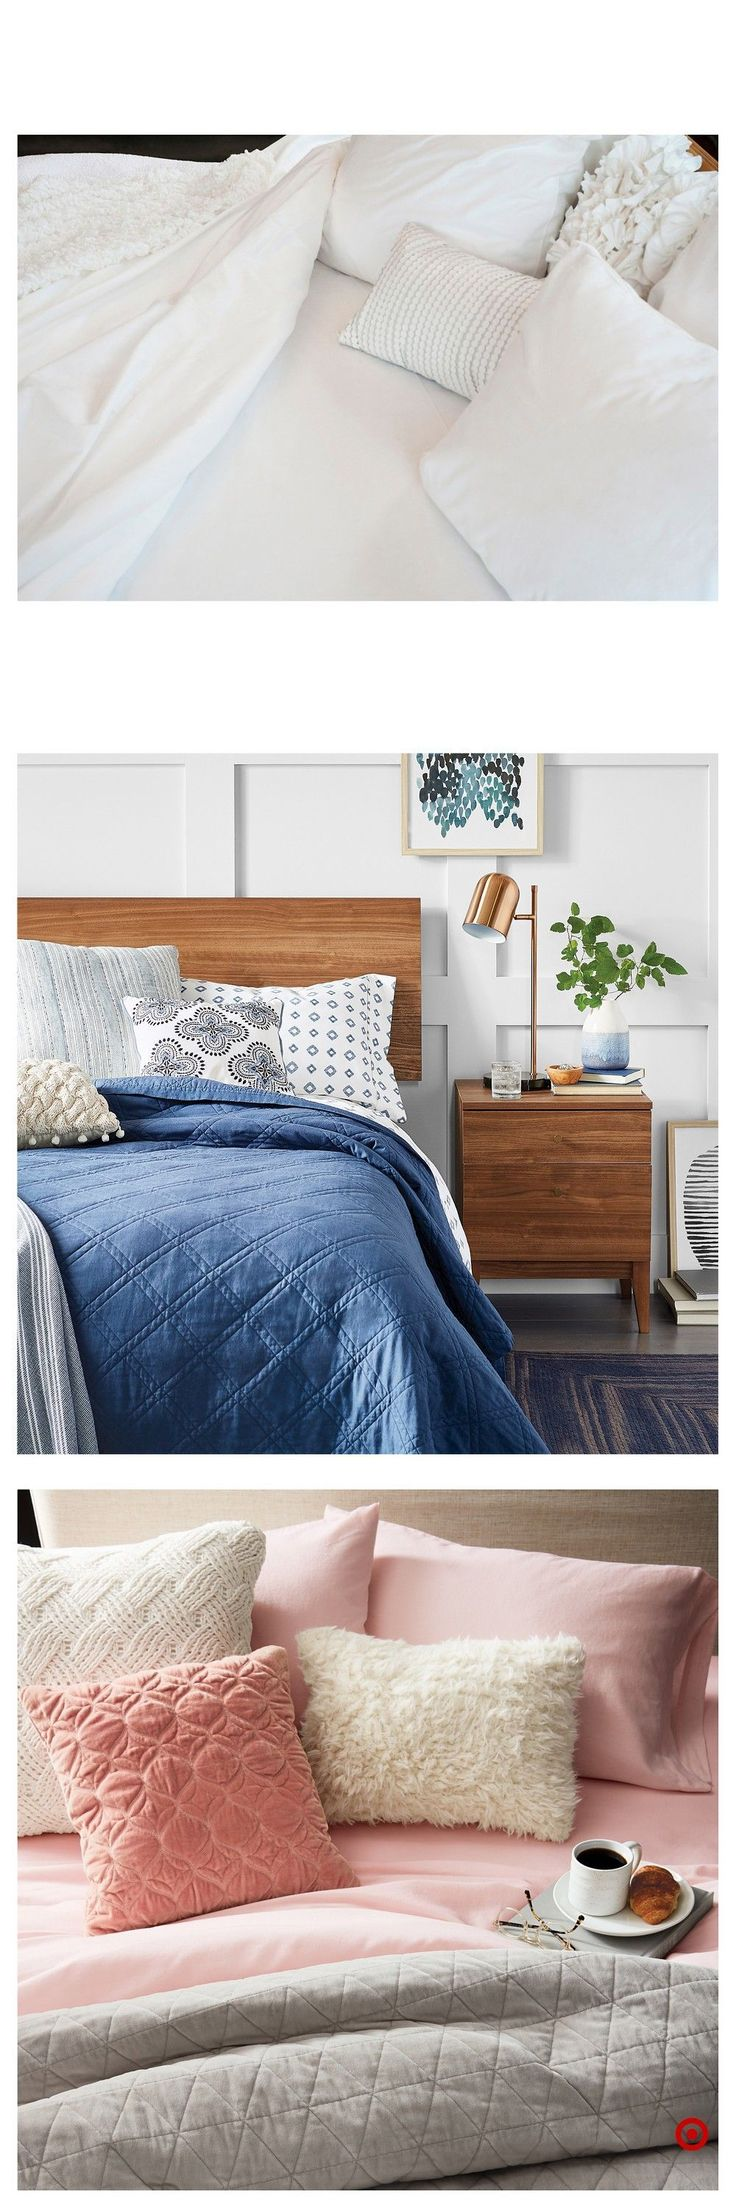 16 best bedroom 2 images on pinterest bedroom bedrooms and